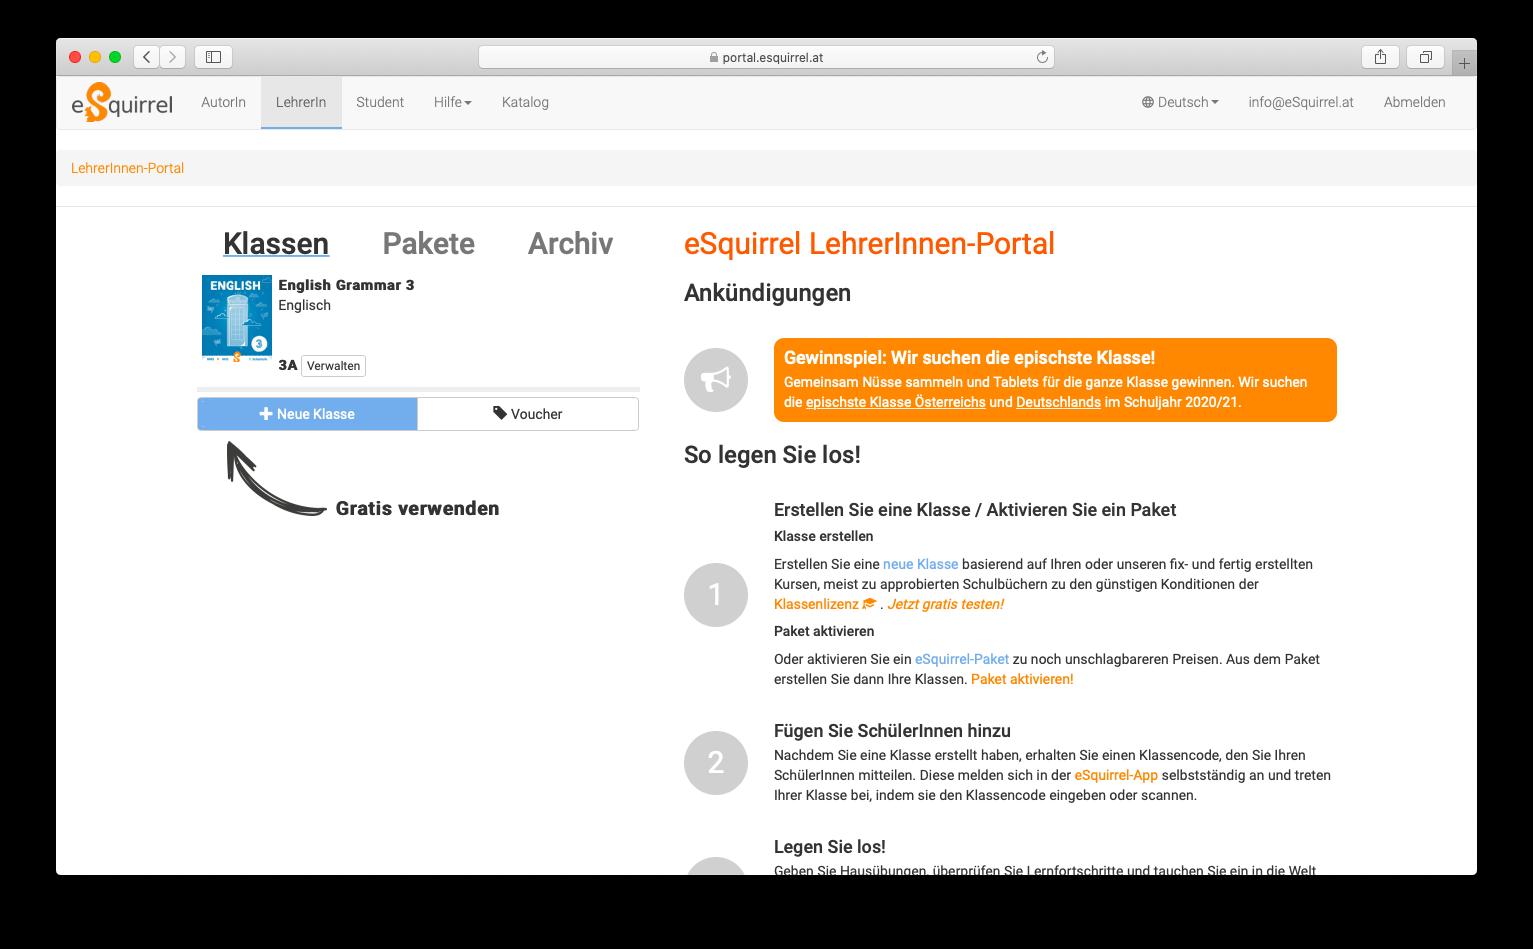 LehrerInnen-Portal